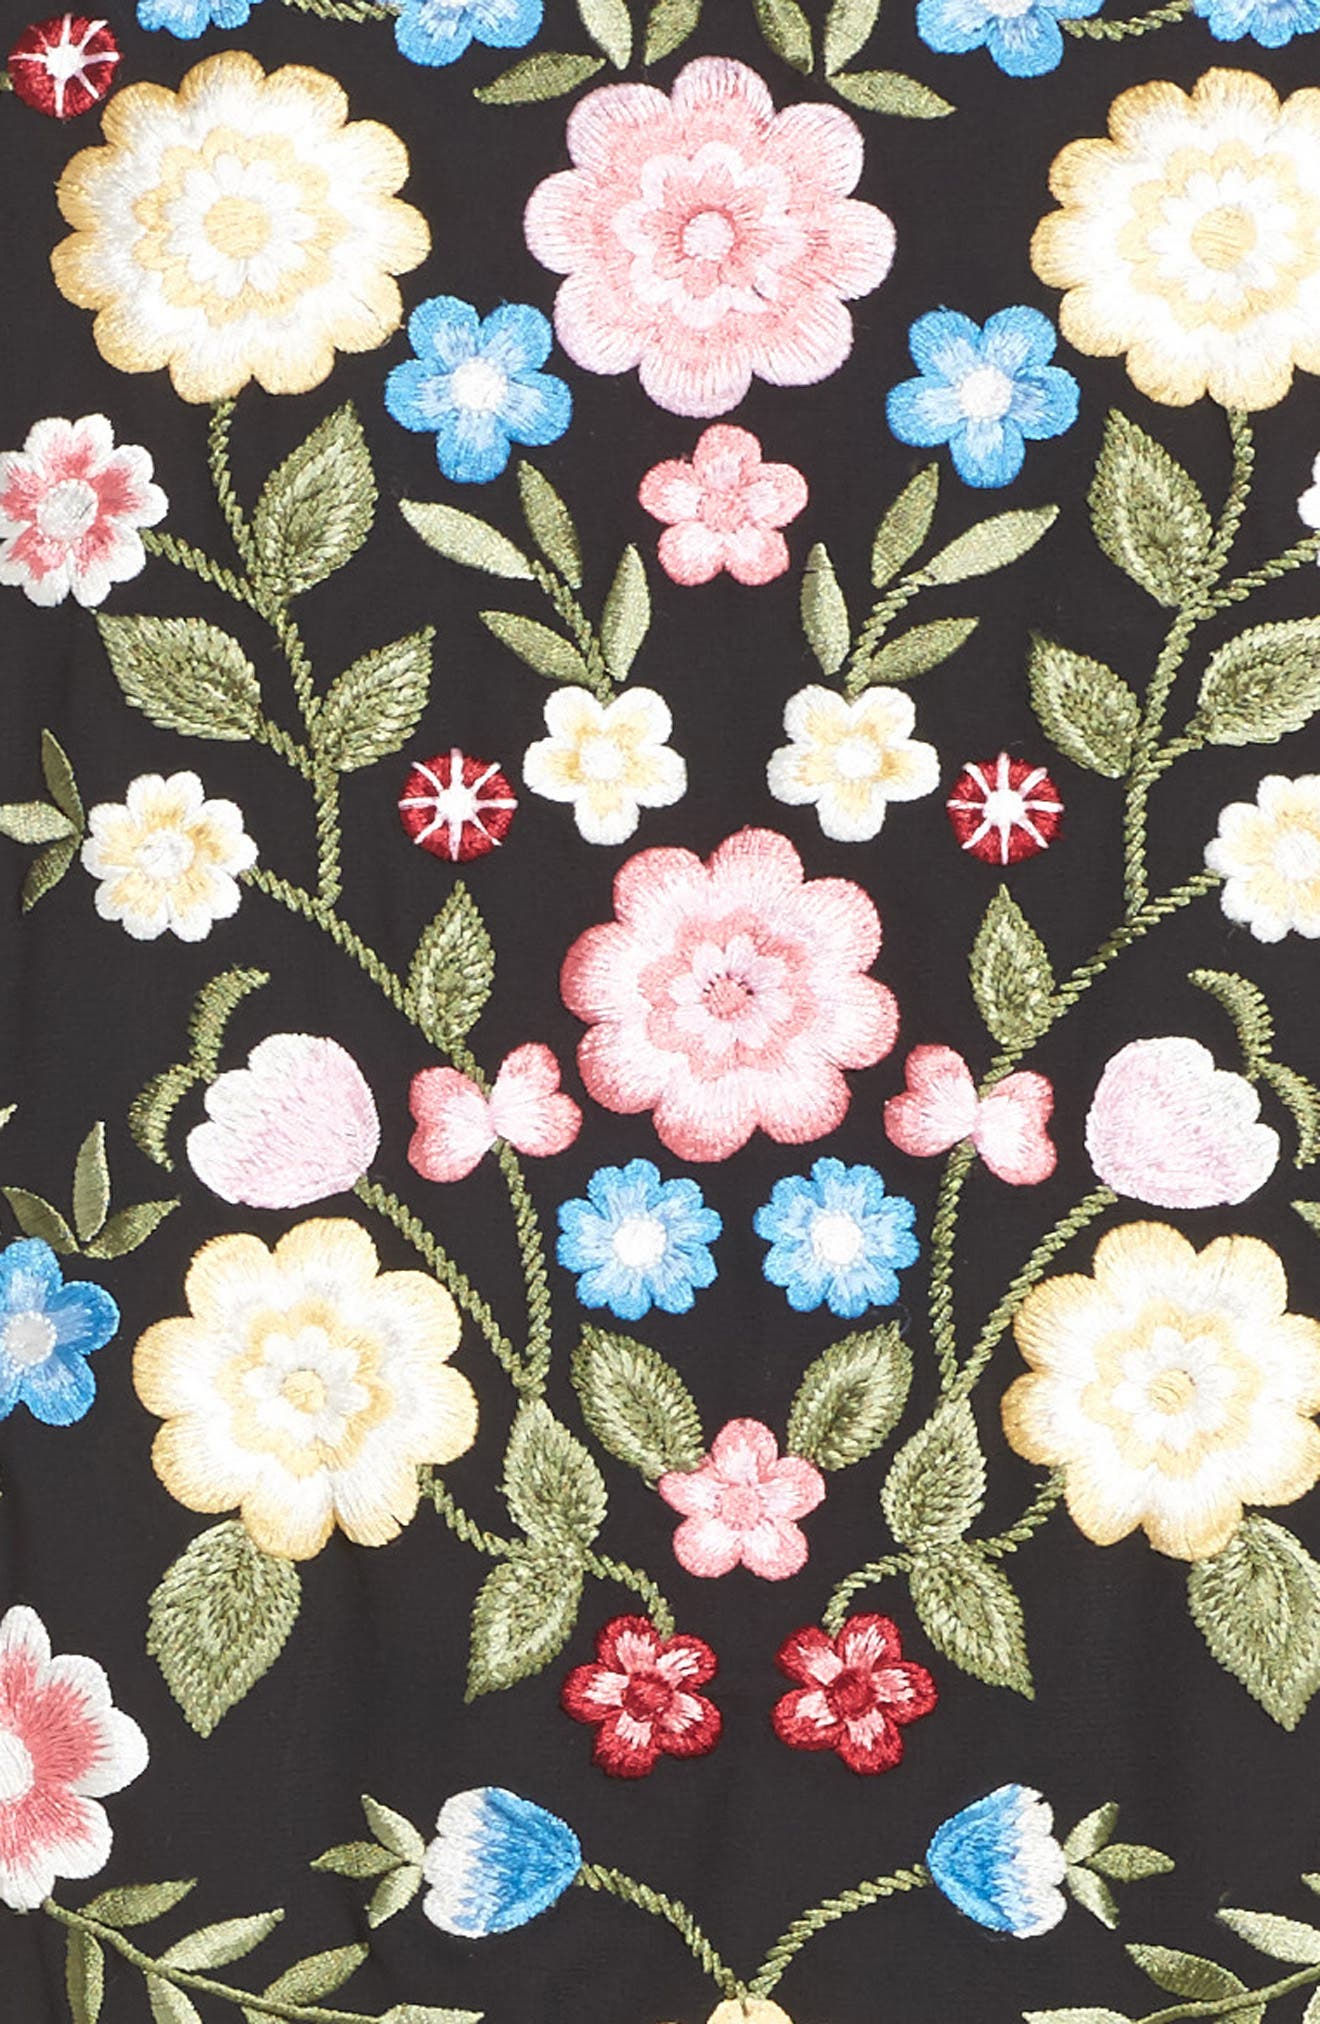 Flower Foliage Embroidered Bomber Jacket,                             Alternate thumbnail 5, color,                             Black